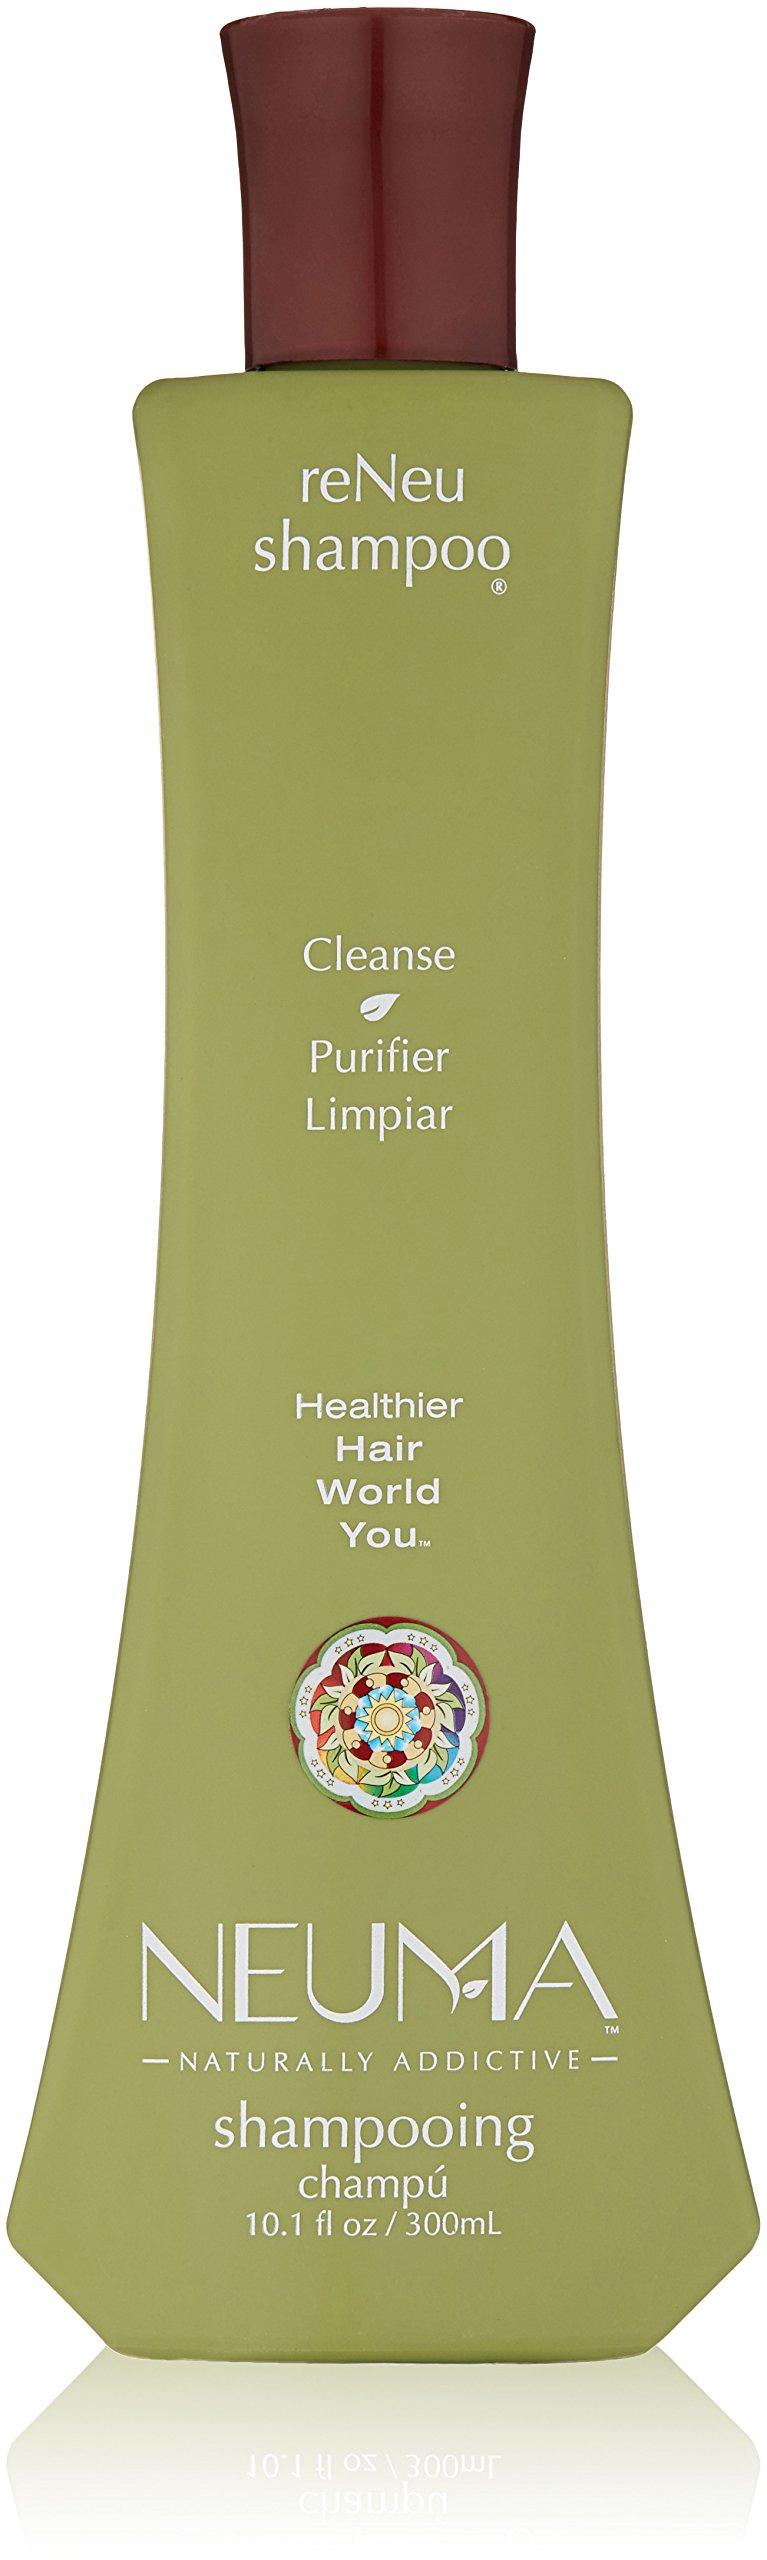 Neuma ReNeu Cleanse Shampoo, 10.1 Fluid Ounce by Neuma (Image #4)